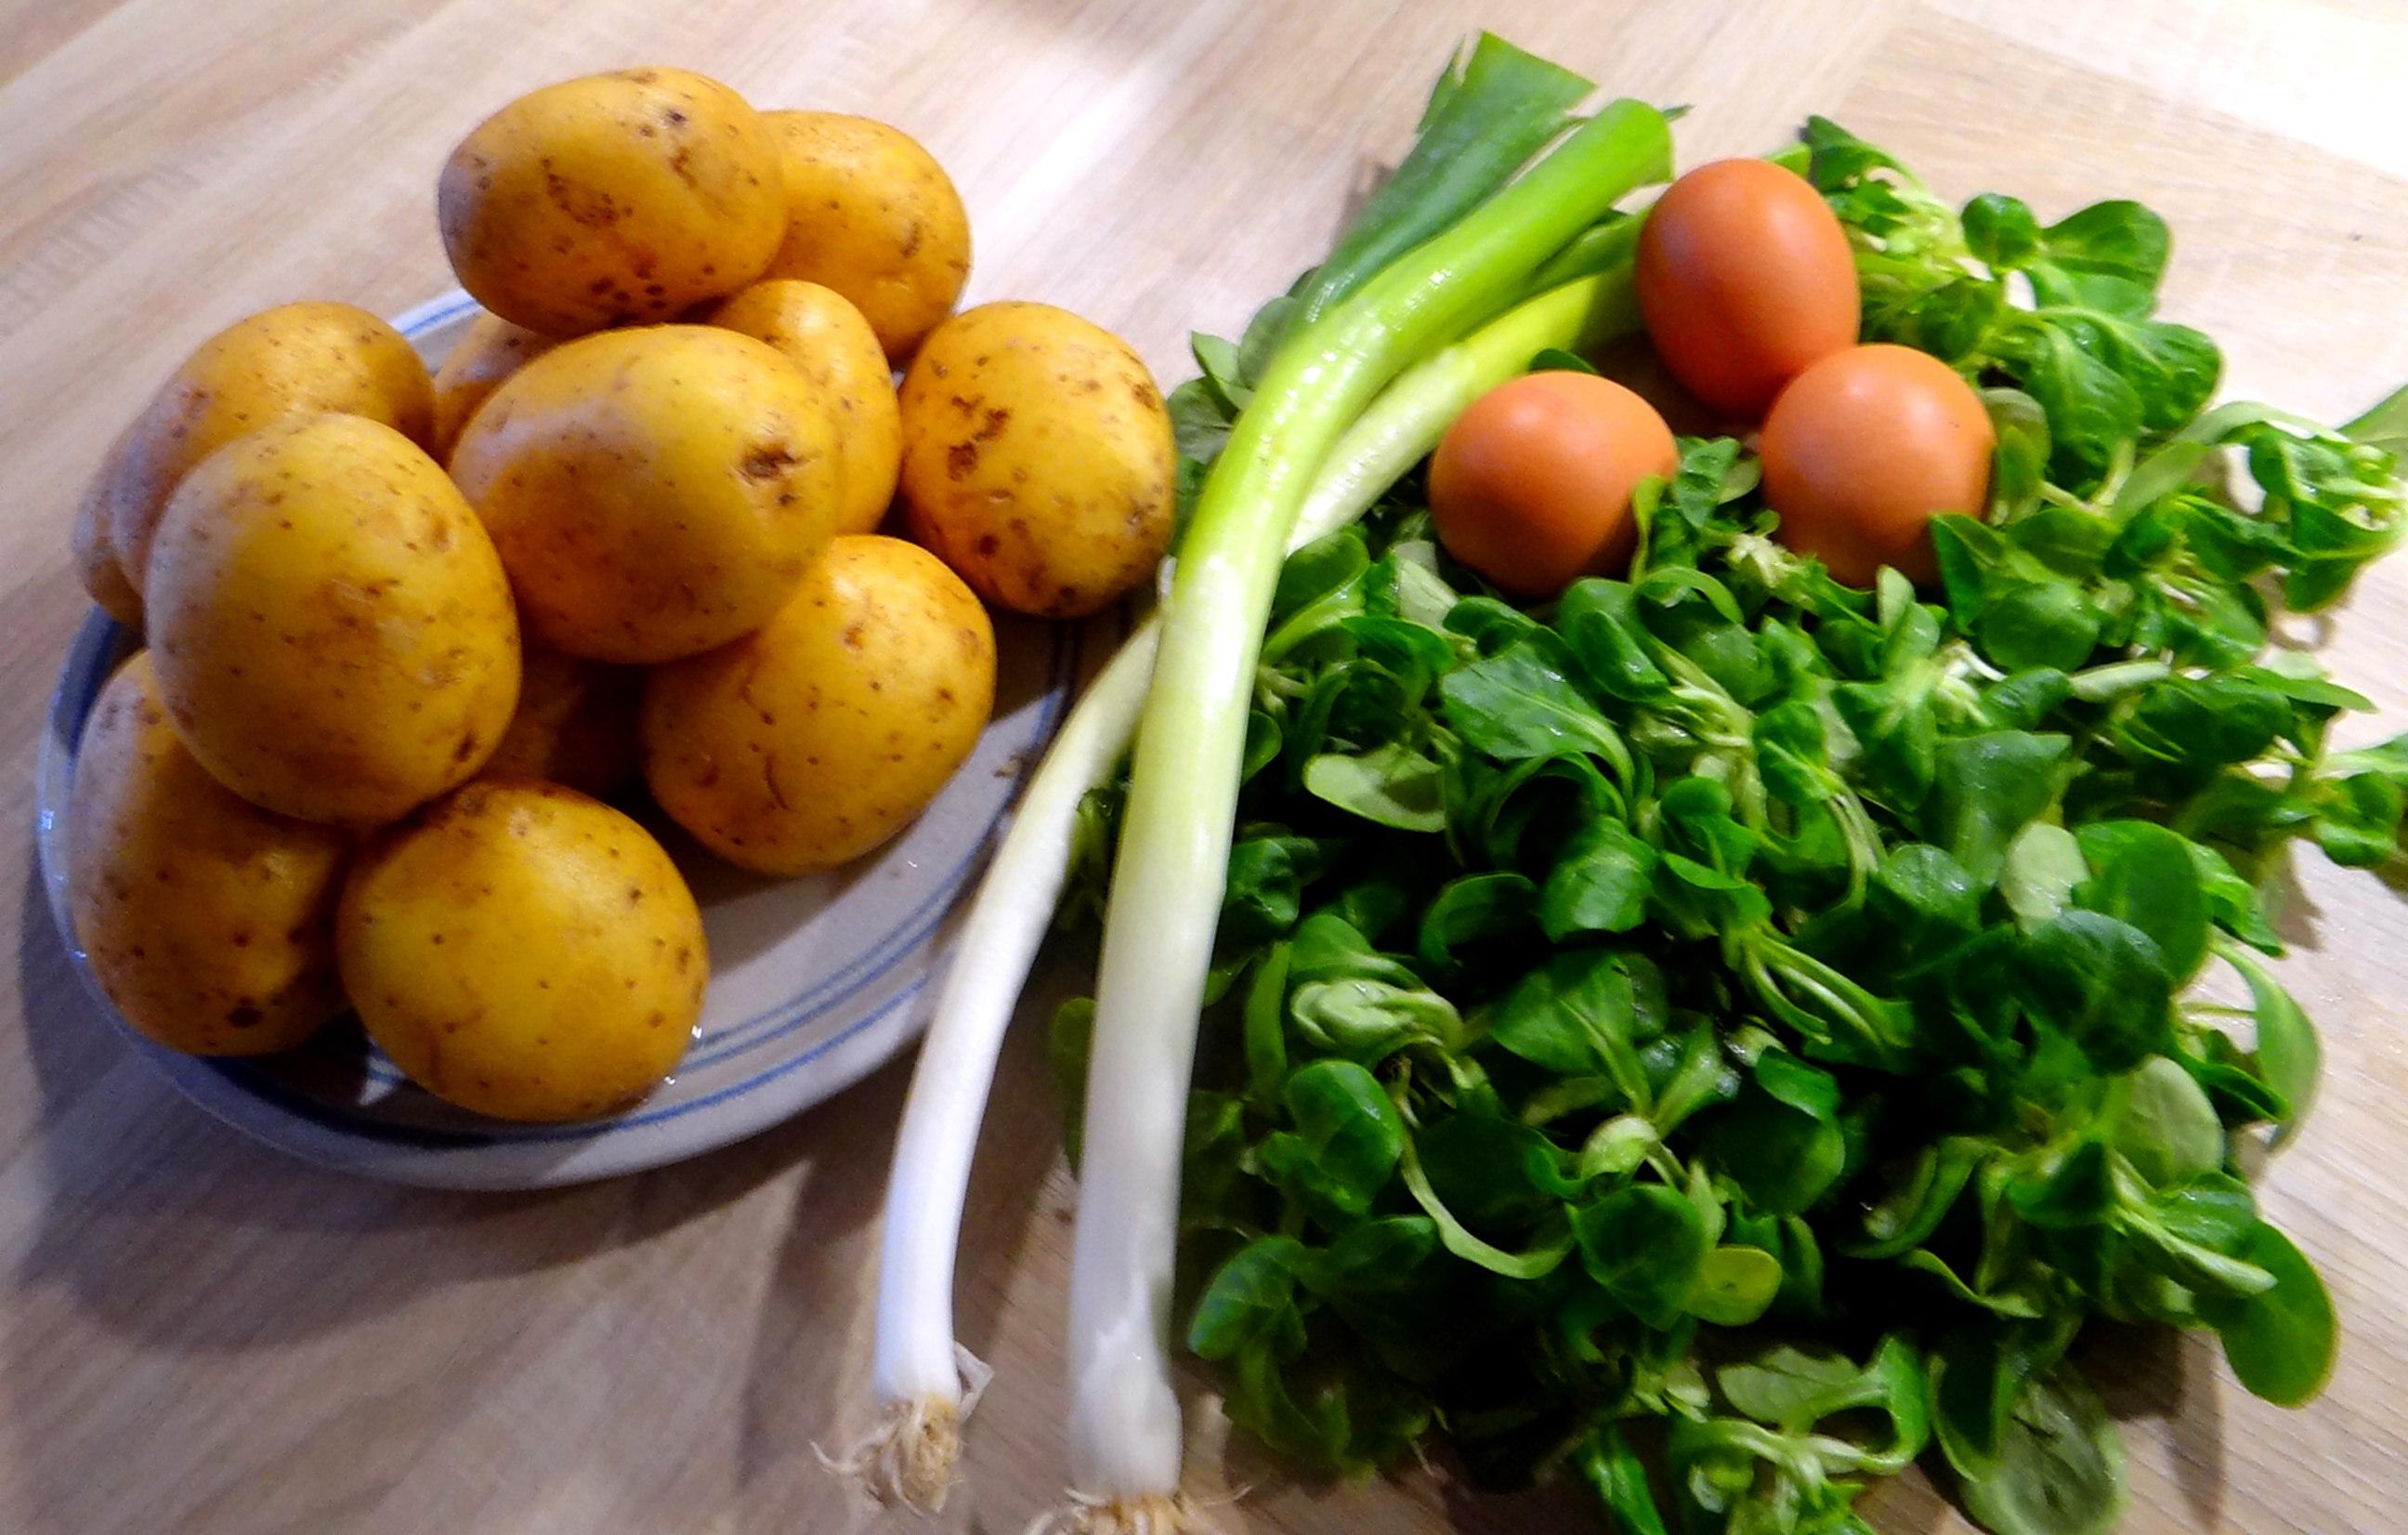 Schlotziger Kartoffelsalat,poschierte Eier,Quarkspeise (6)